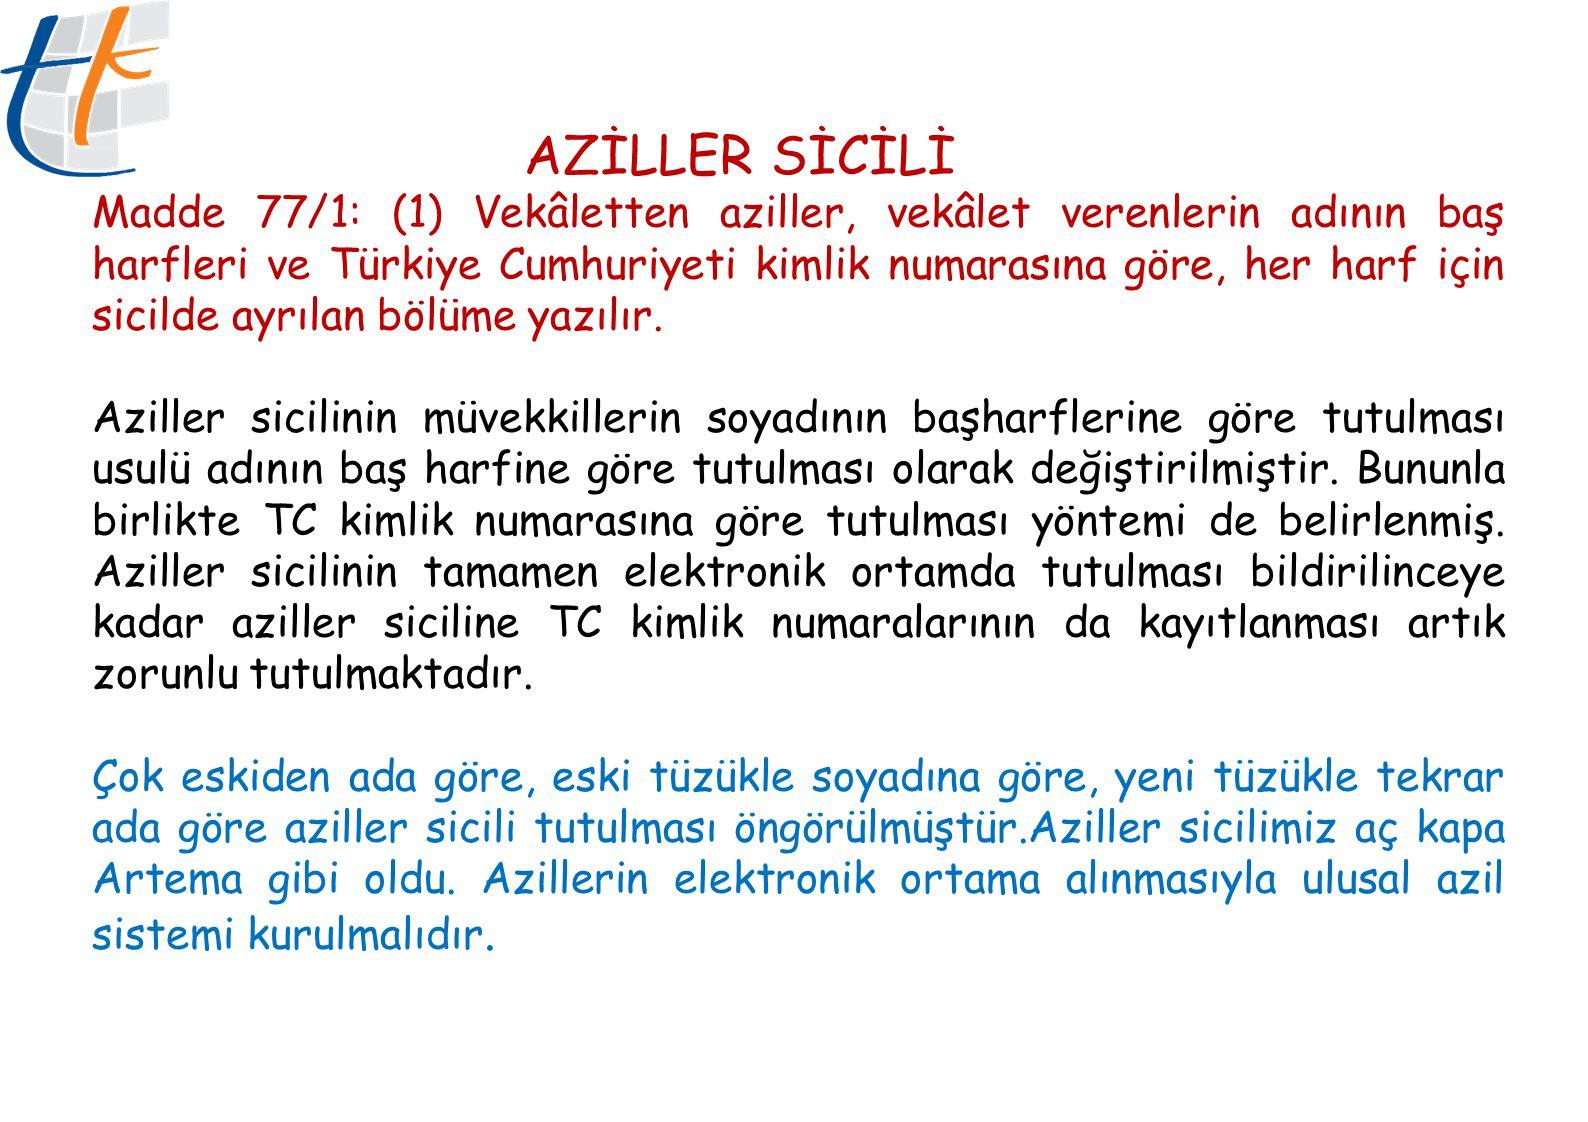 AZİLLER SİCİLİ